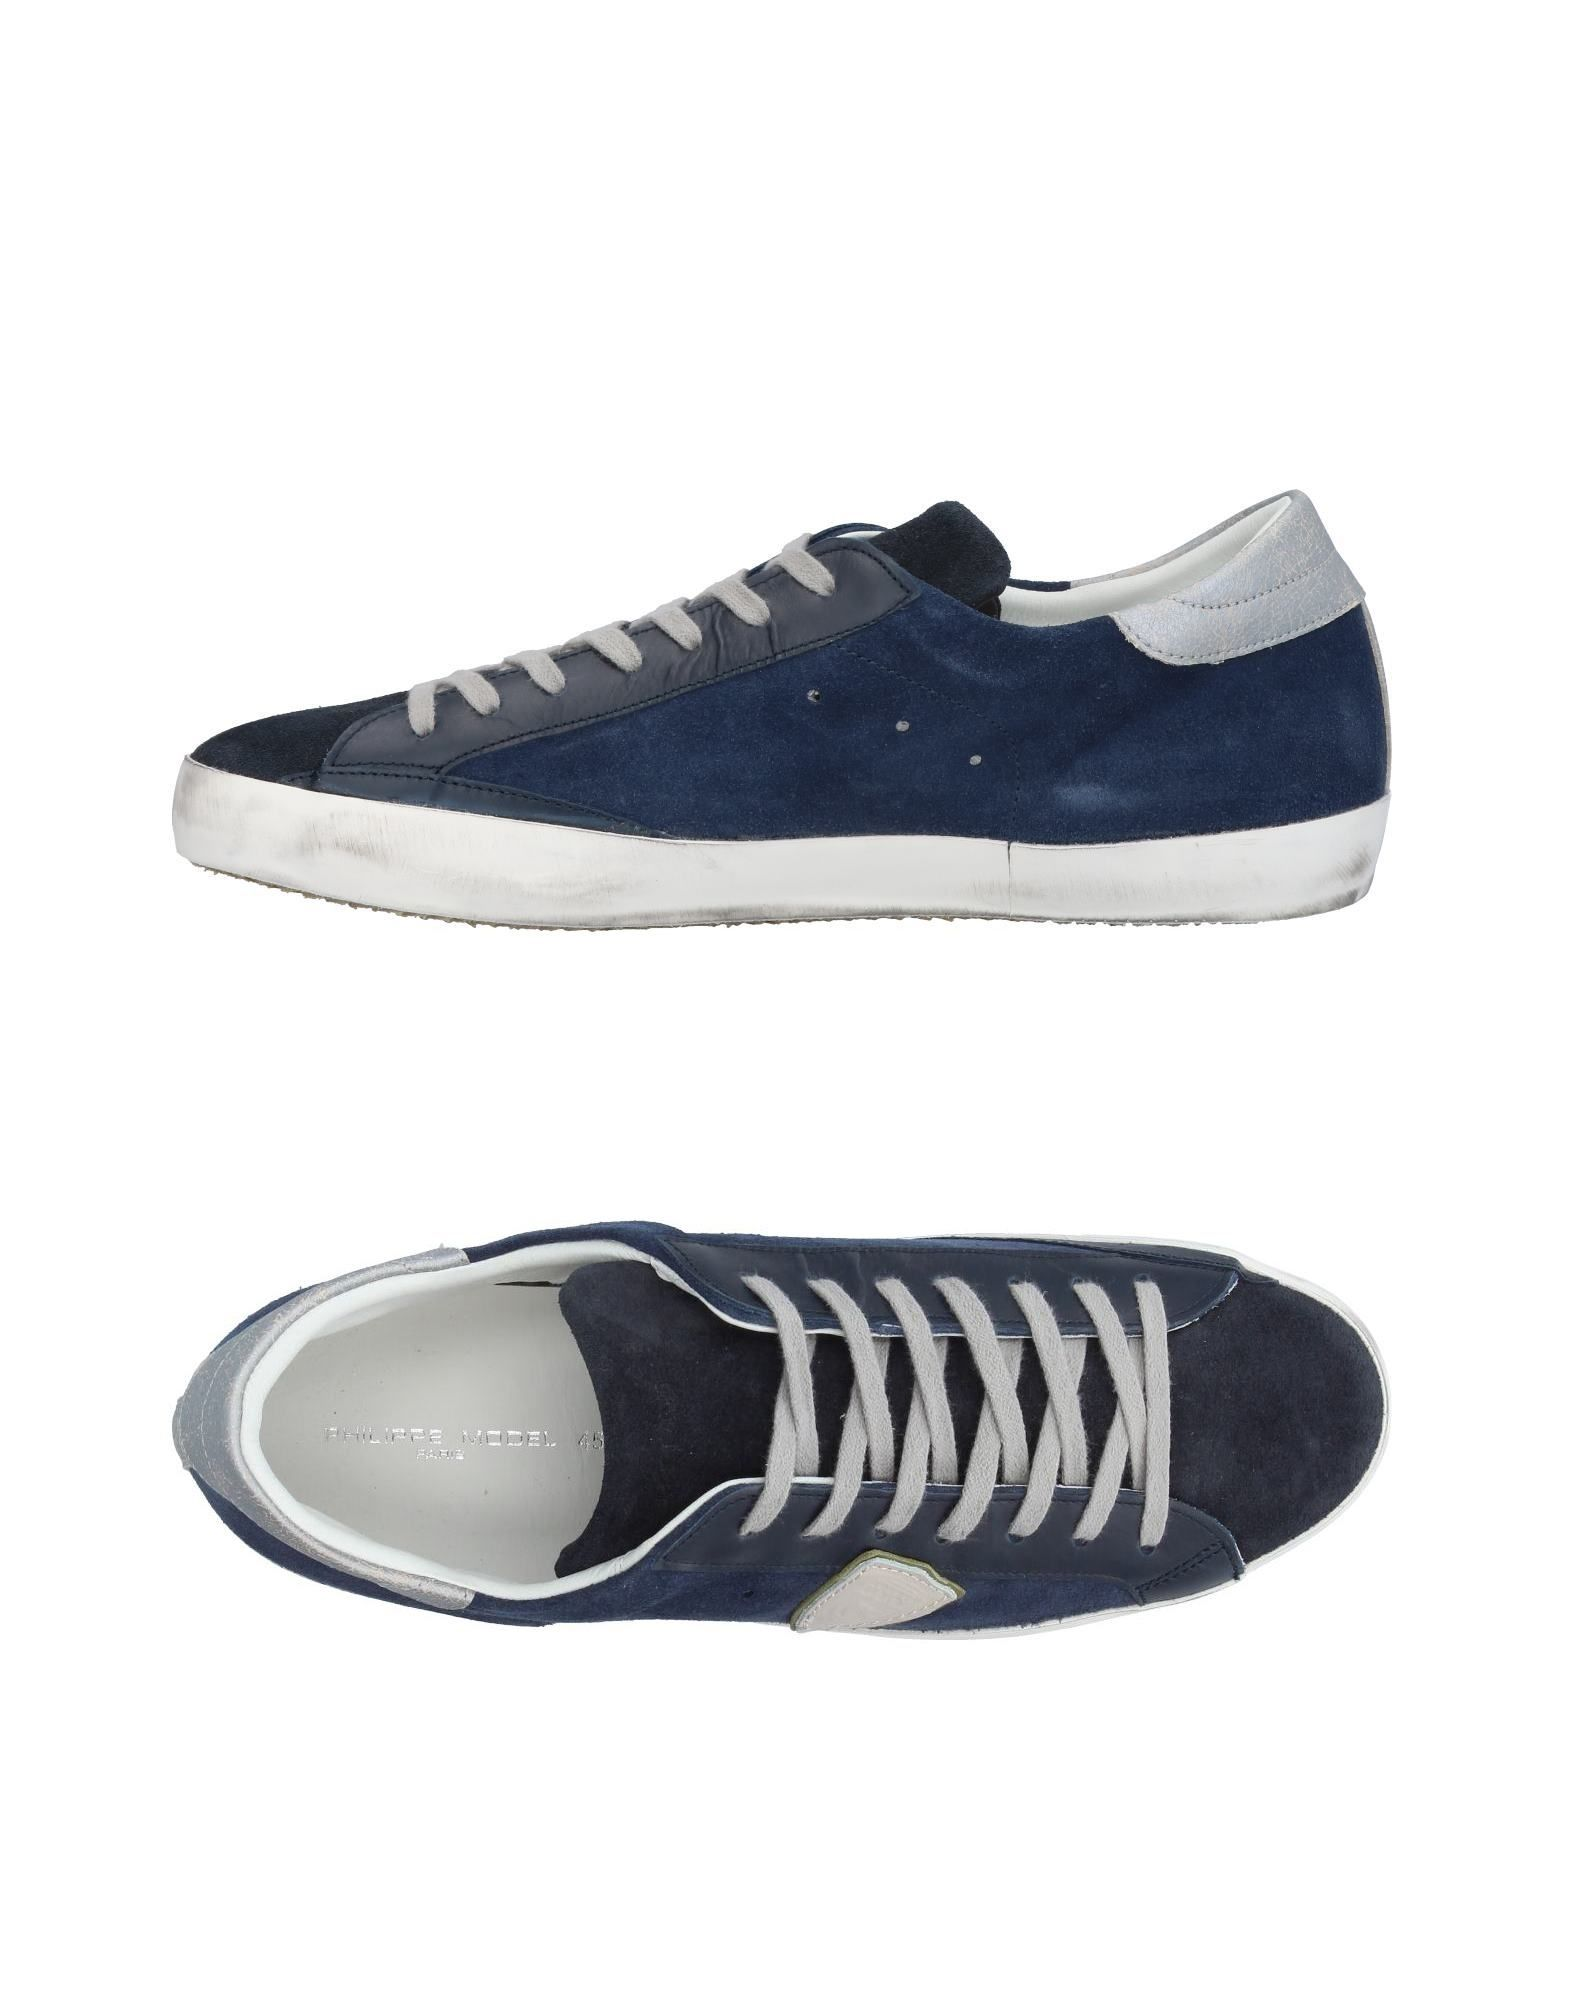 Philippe Sneakers Model Sneakers Philippe Herren  11413176KW 53249a